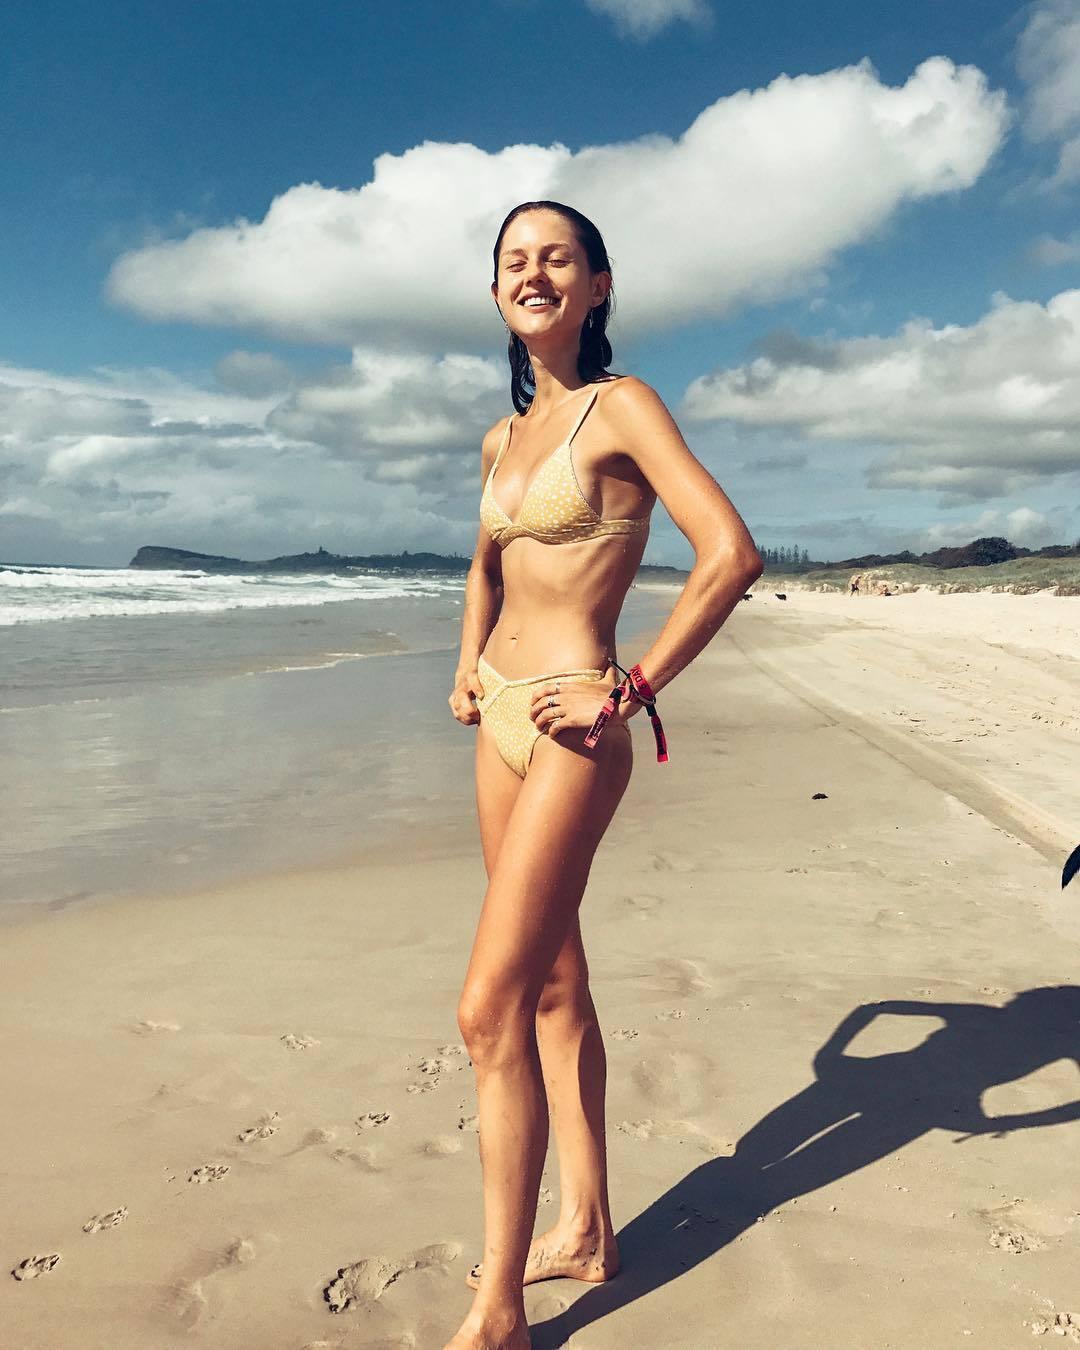 Bikini Isabelle Cornish nudes (41 foto and video), Tits, Is a cute, Twitter, legs 2018